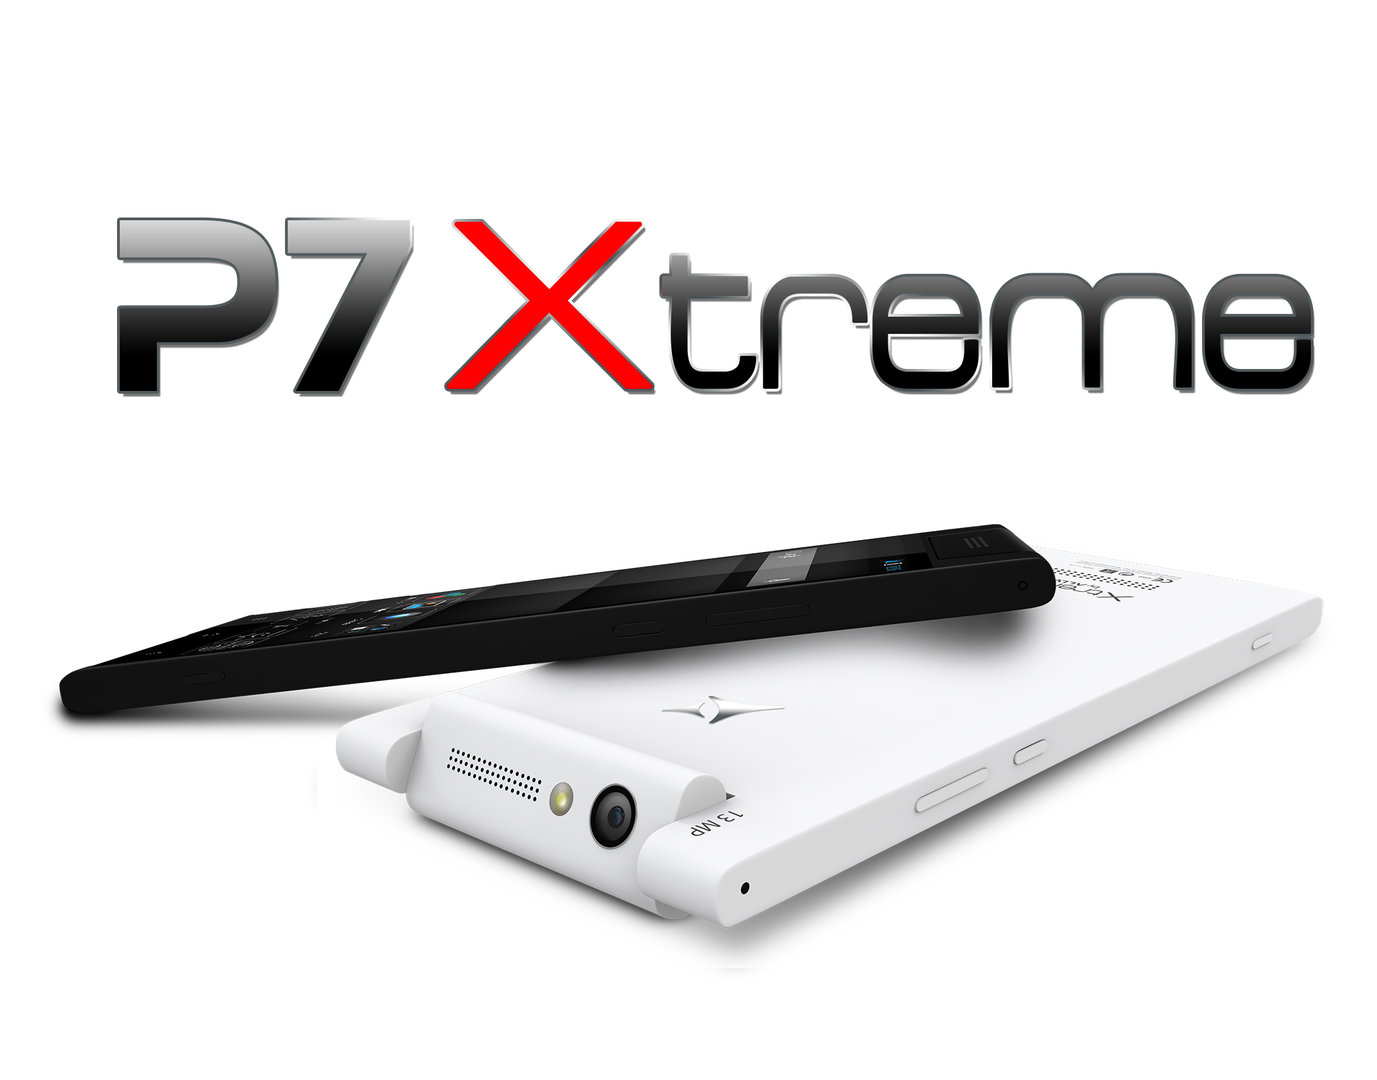 Allview P7 Xtreme